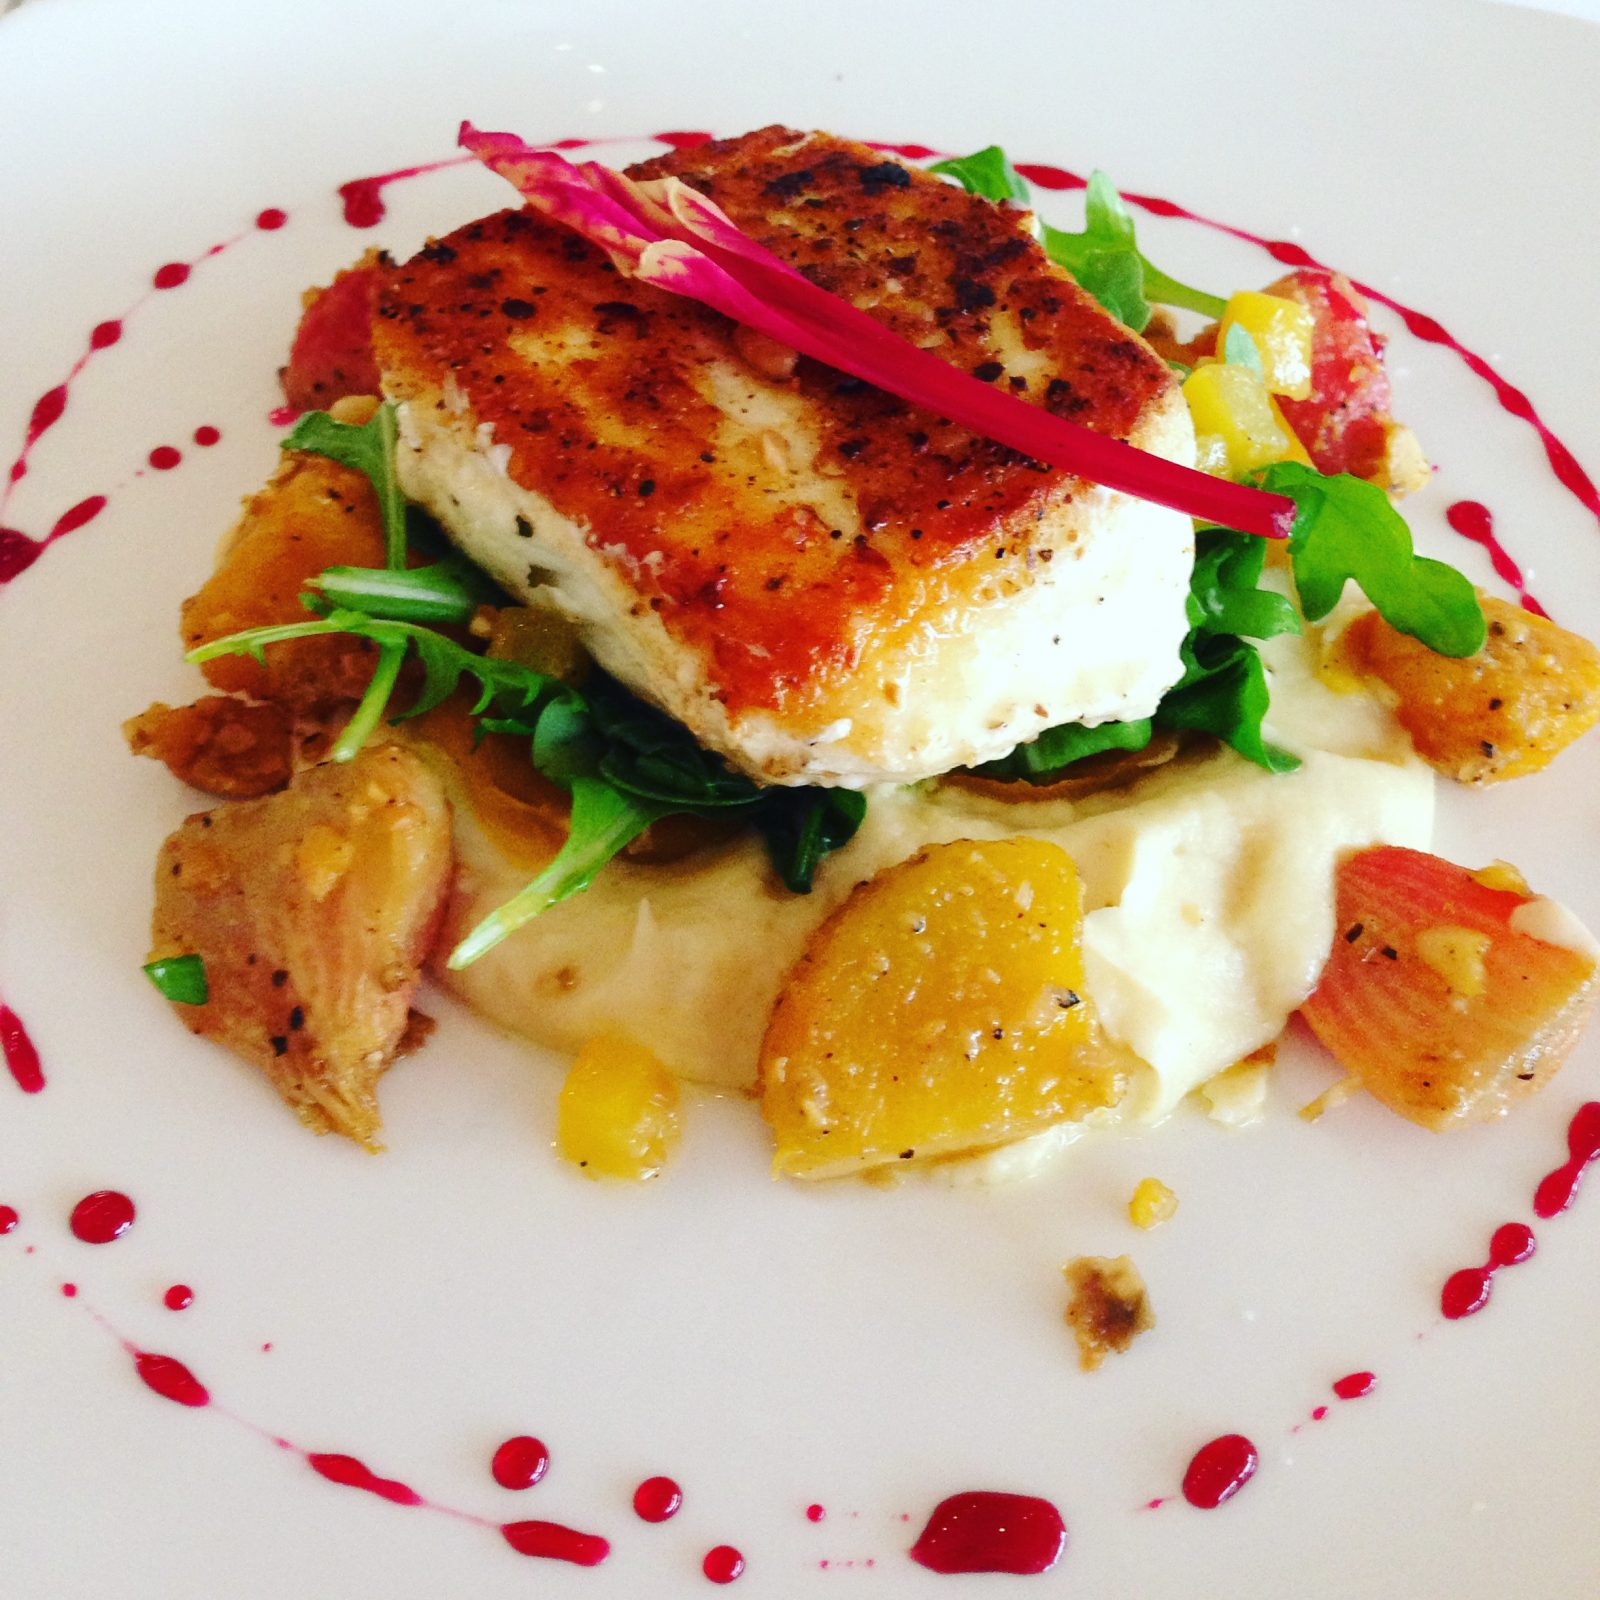 gourmet food from california grill at disney's contemporary resort